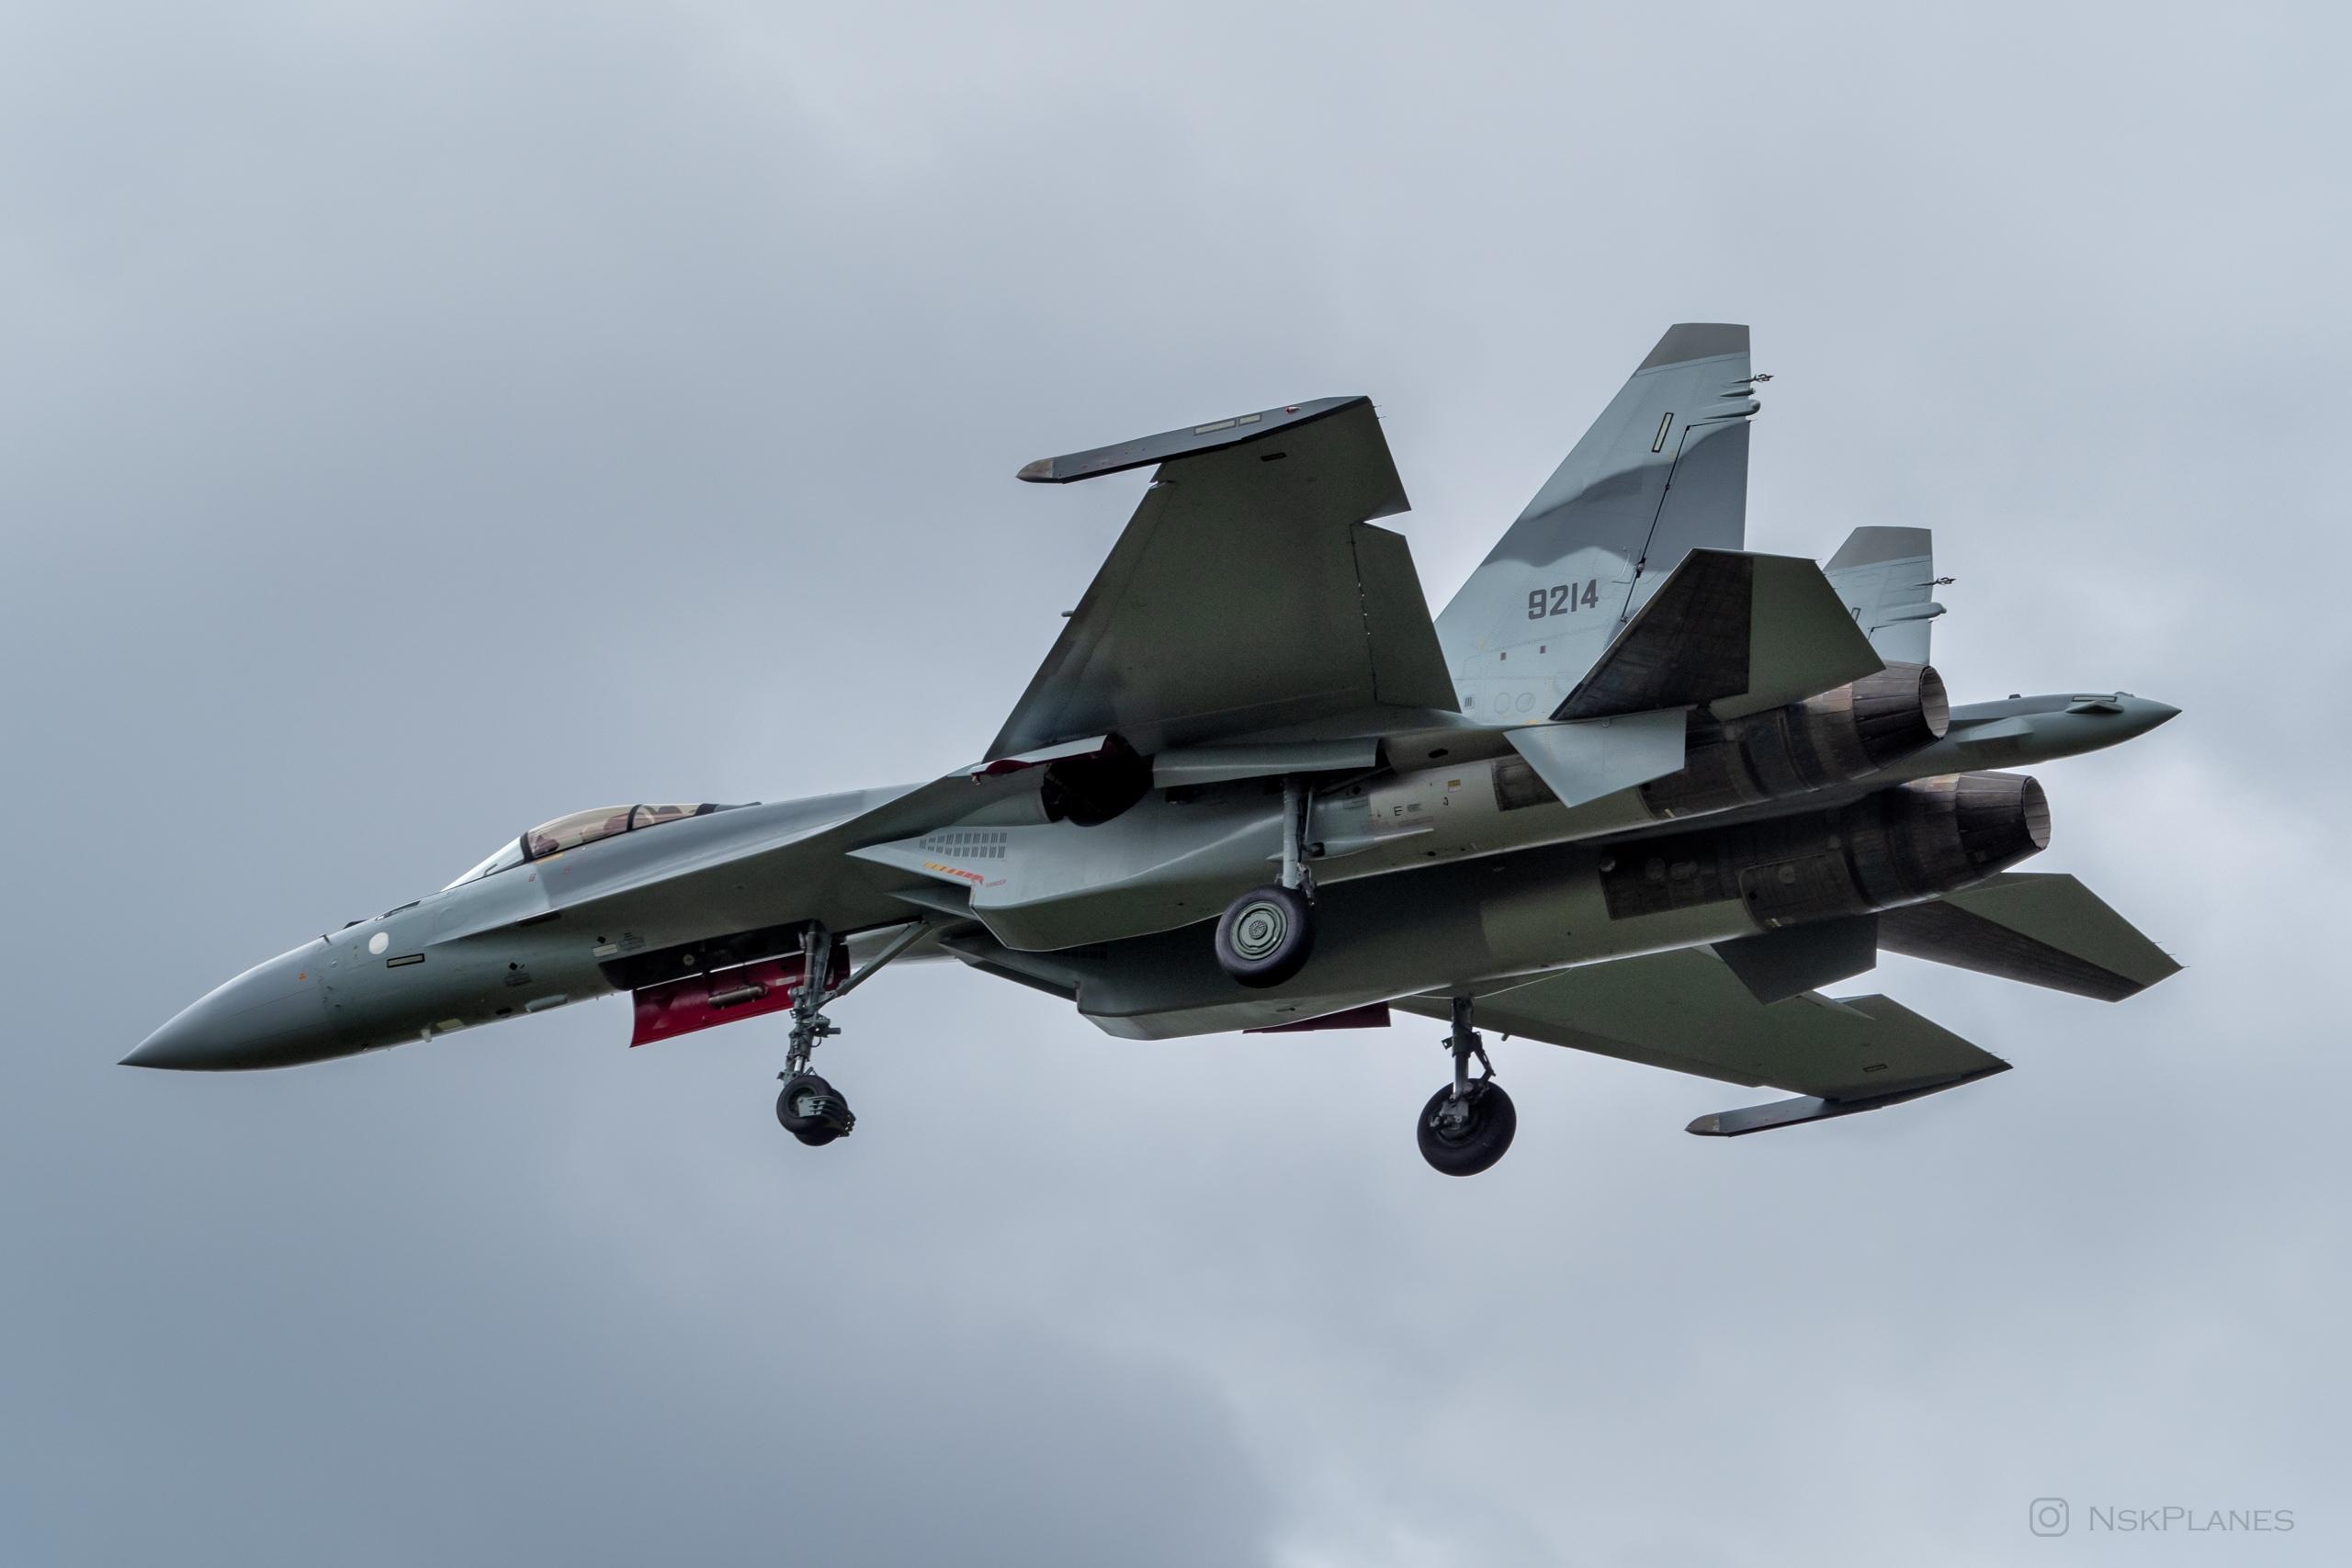 http://forums.airforce.ru/attachments/sovremennost/100198d1595419760-ipvfbavs3ee.jpg/